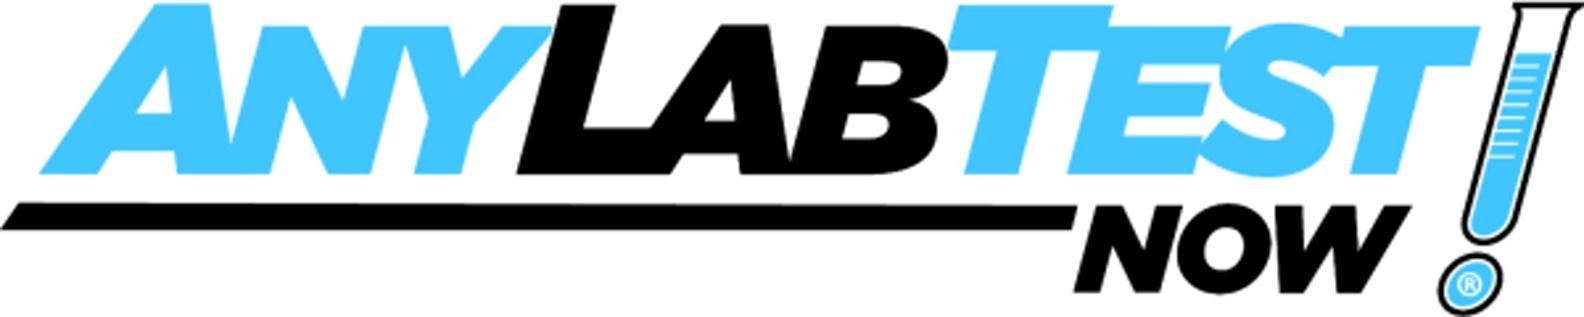 Any Lab Test Now - Alliance Logo